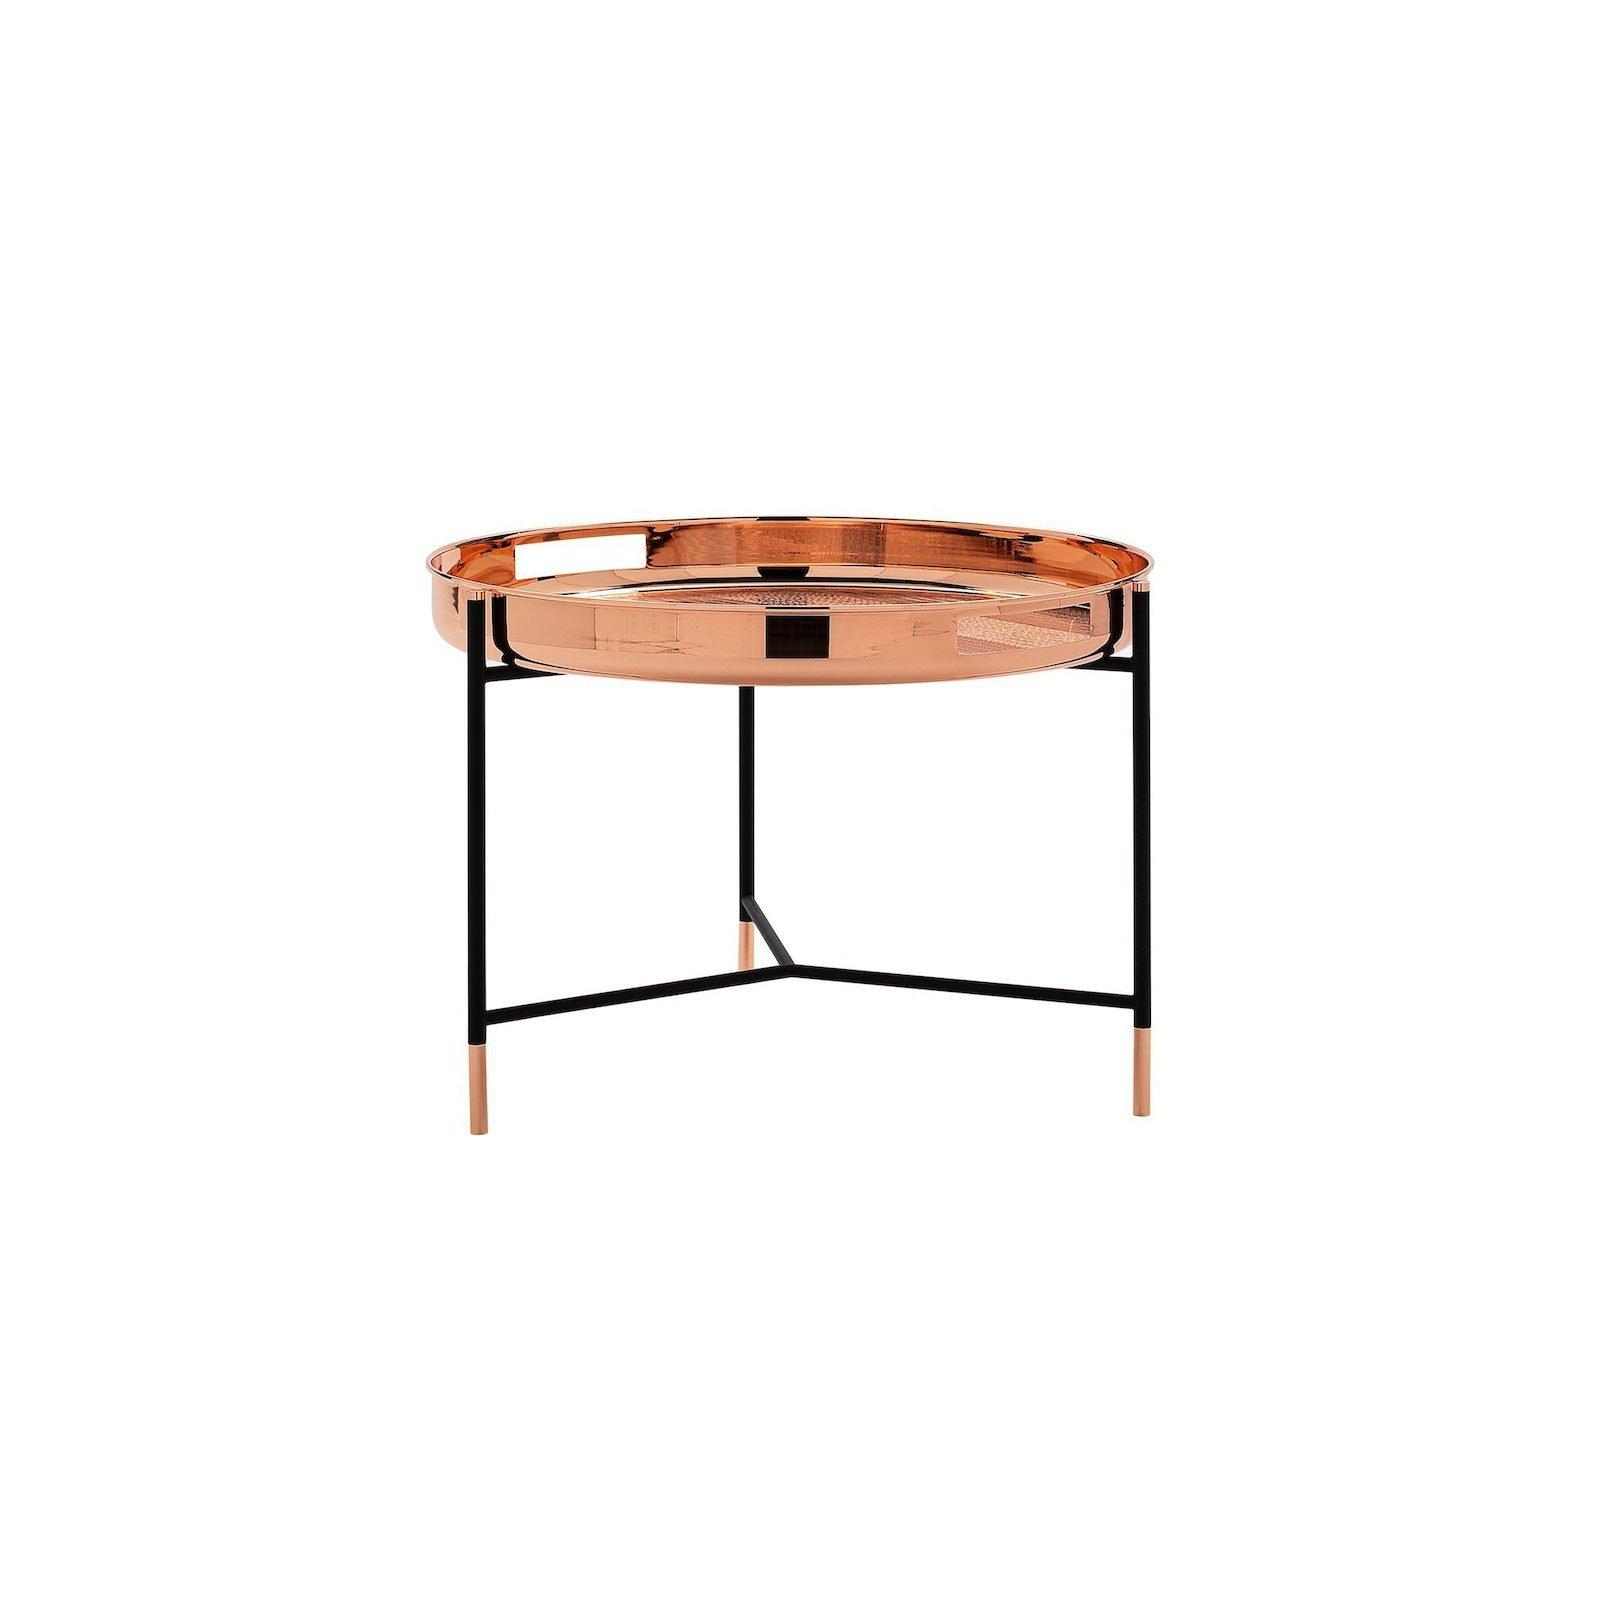 tavolino-basso-con-vassoio-design-duo-con-vassoio